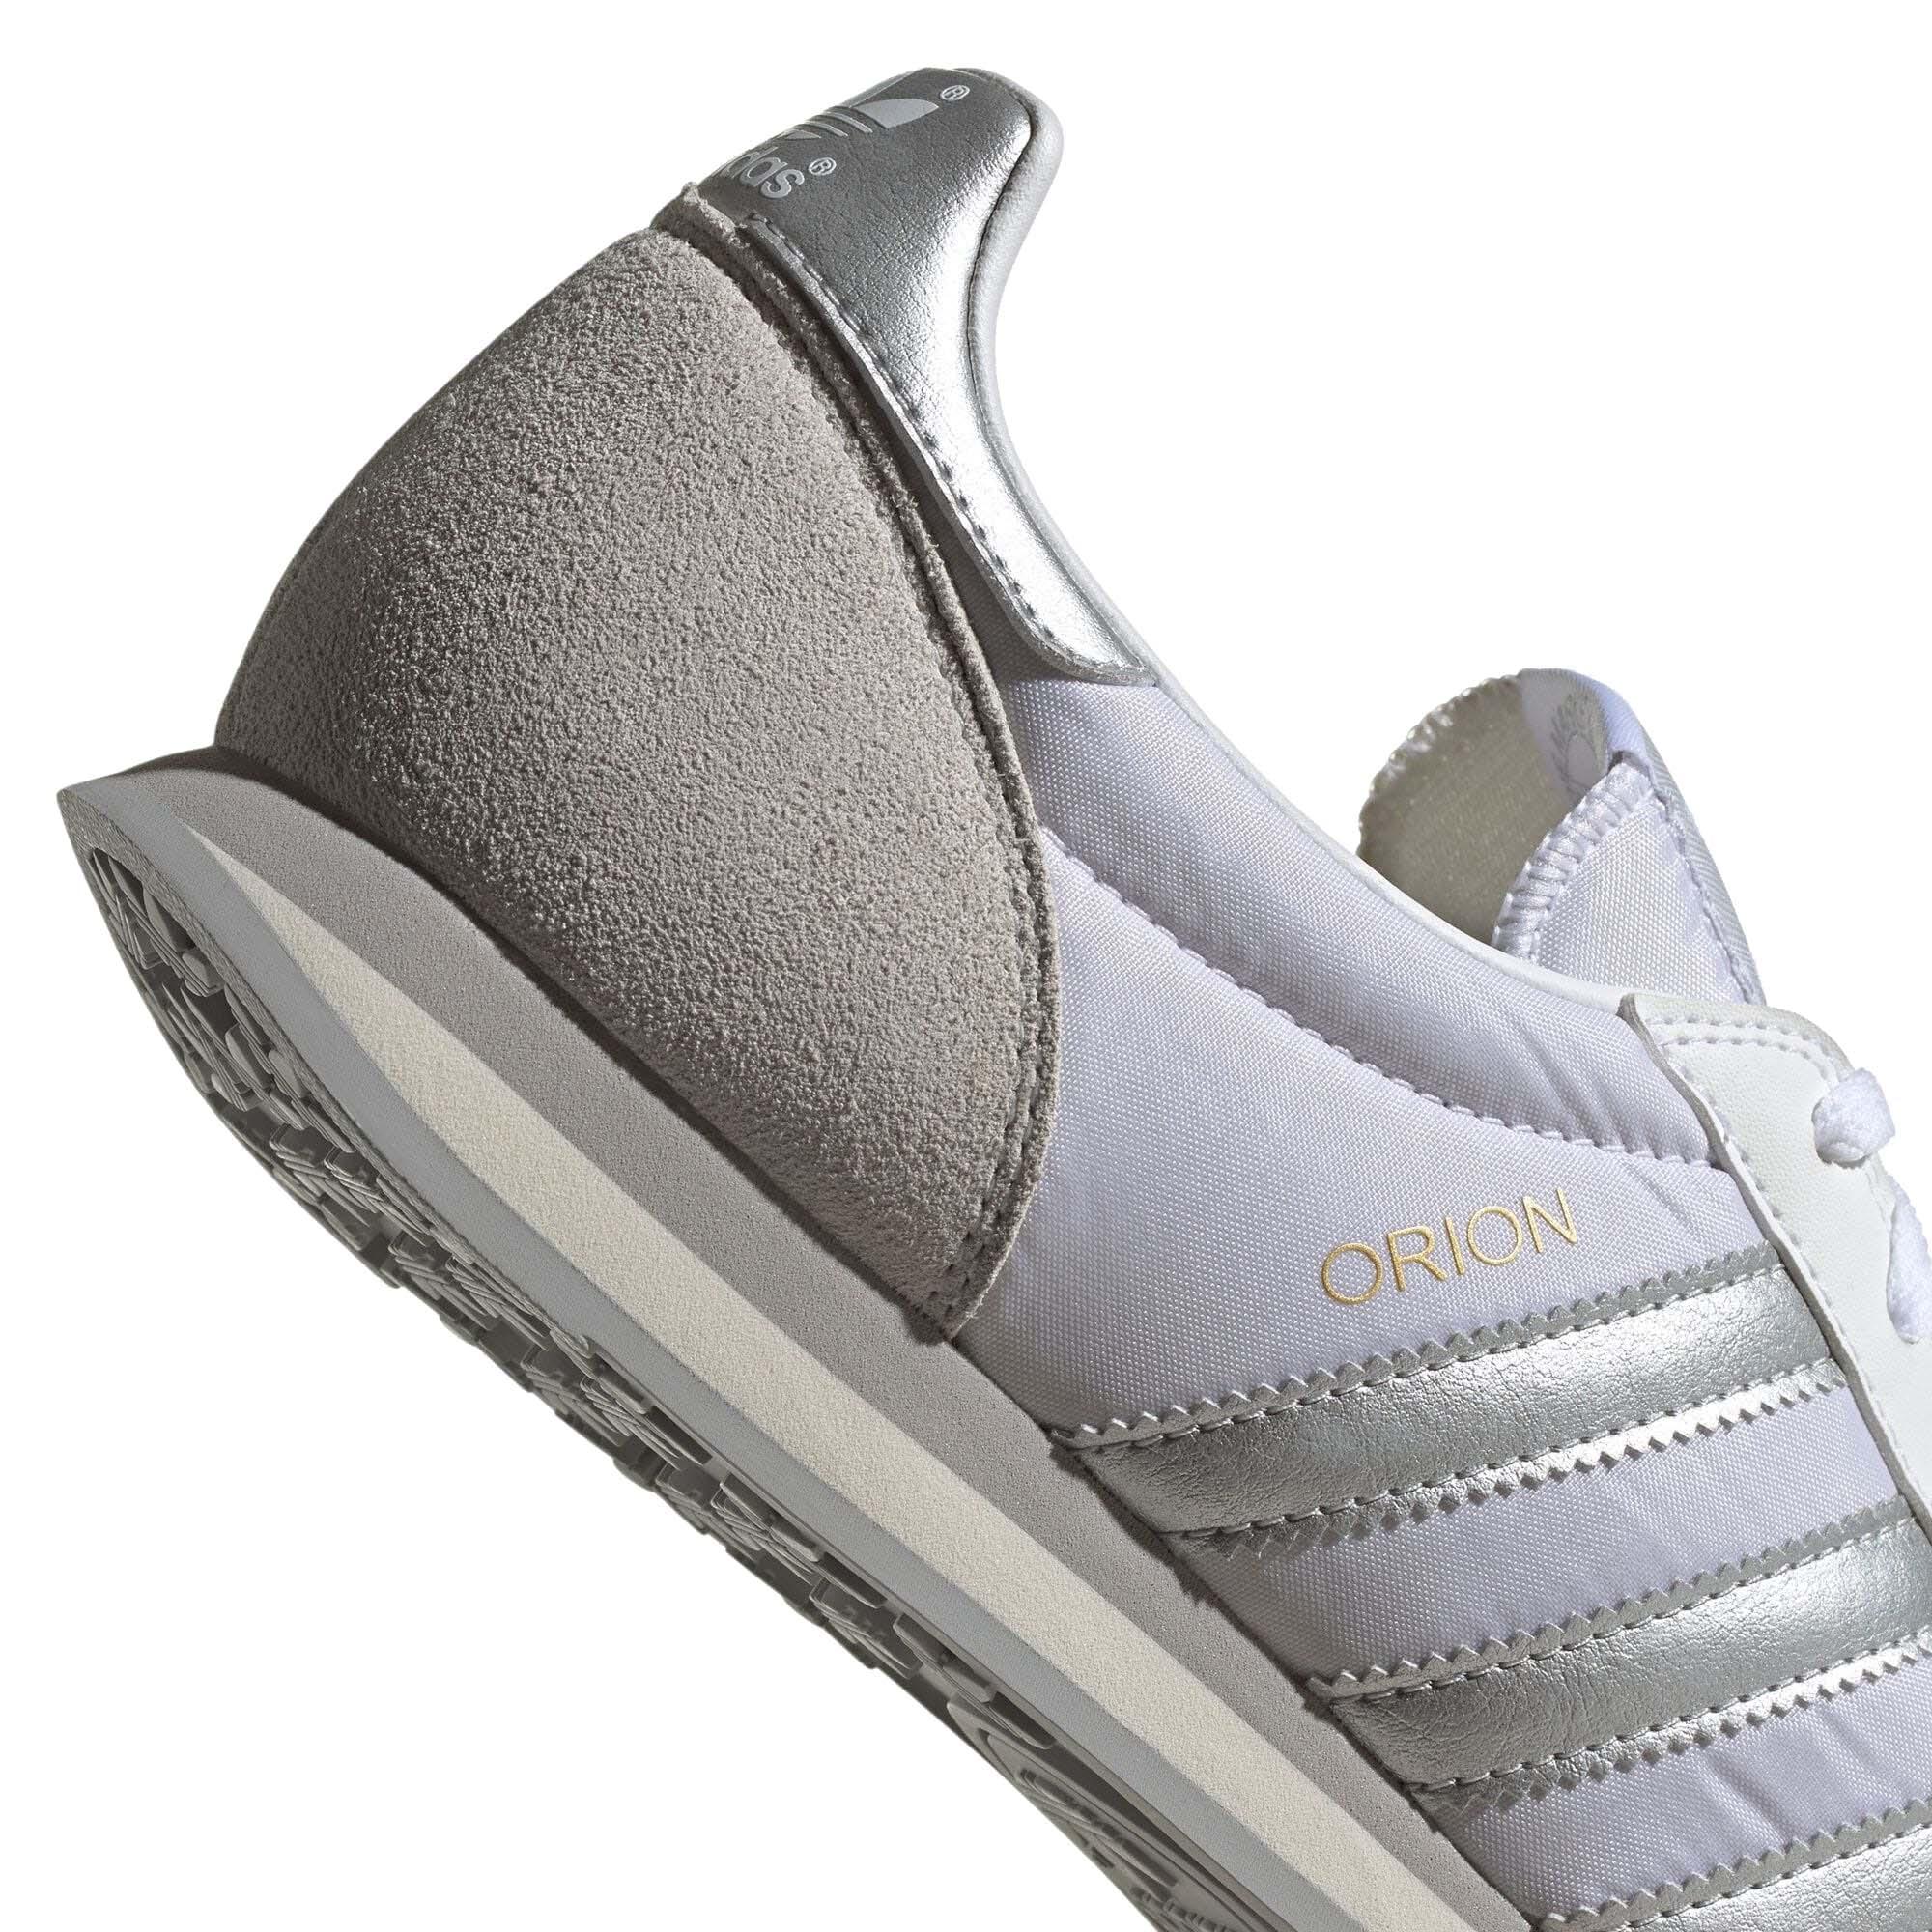 adidas Originals ORION FTWR WHITE / SILVER METALLIC / MATTE GOLD GZ5228 アディダス オリジナルス オリオン ホワイト/シルバーメタリック/ゴールド